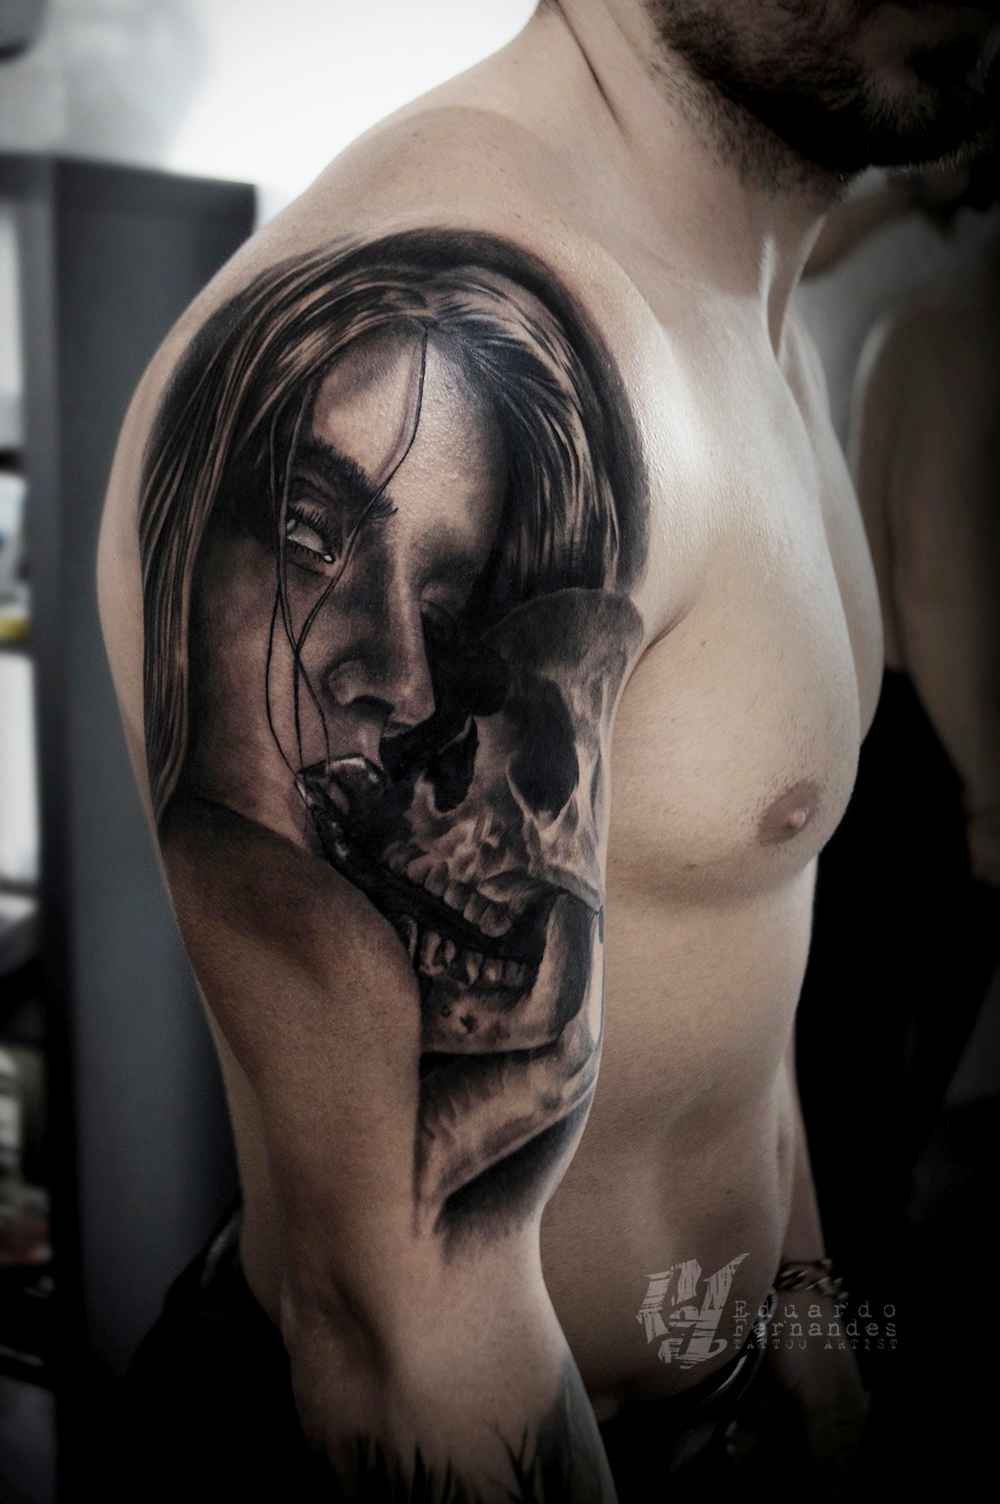 Tattoo rock festival day 2 realism tattoos eduardo fernandes tatuagem realista altavistaventures Choice Image